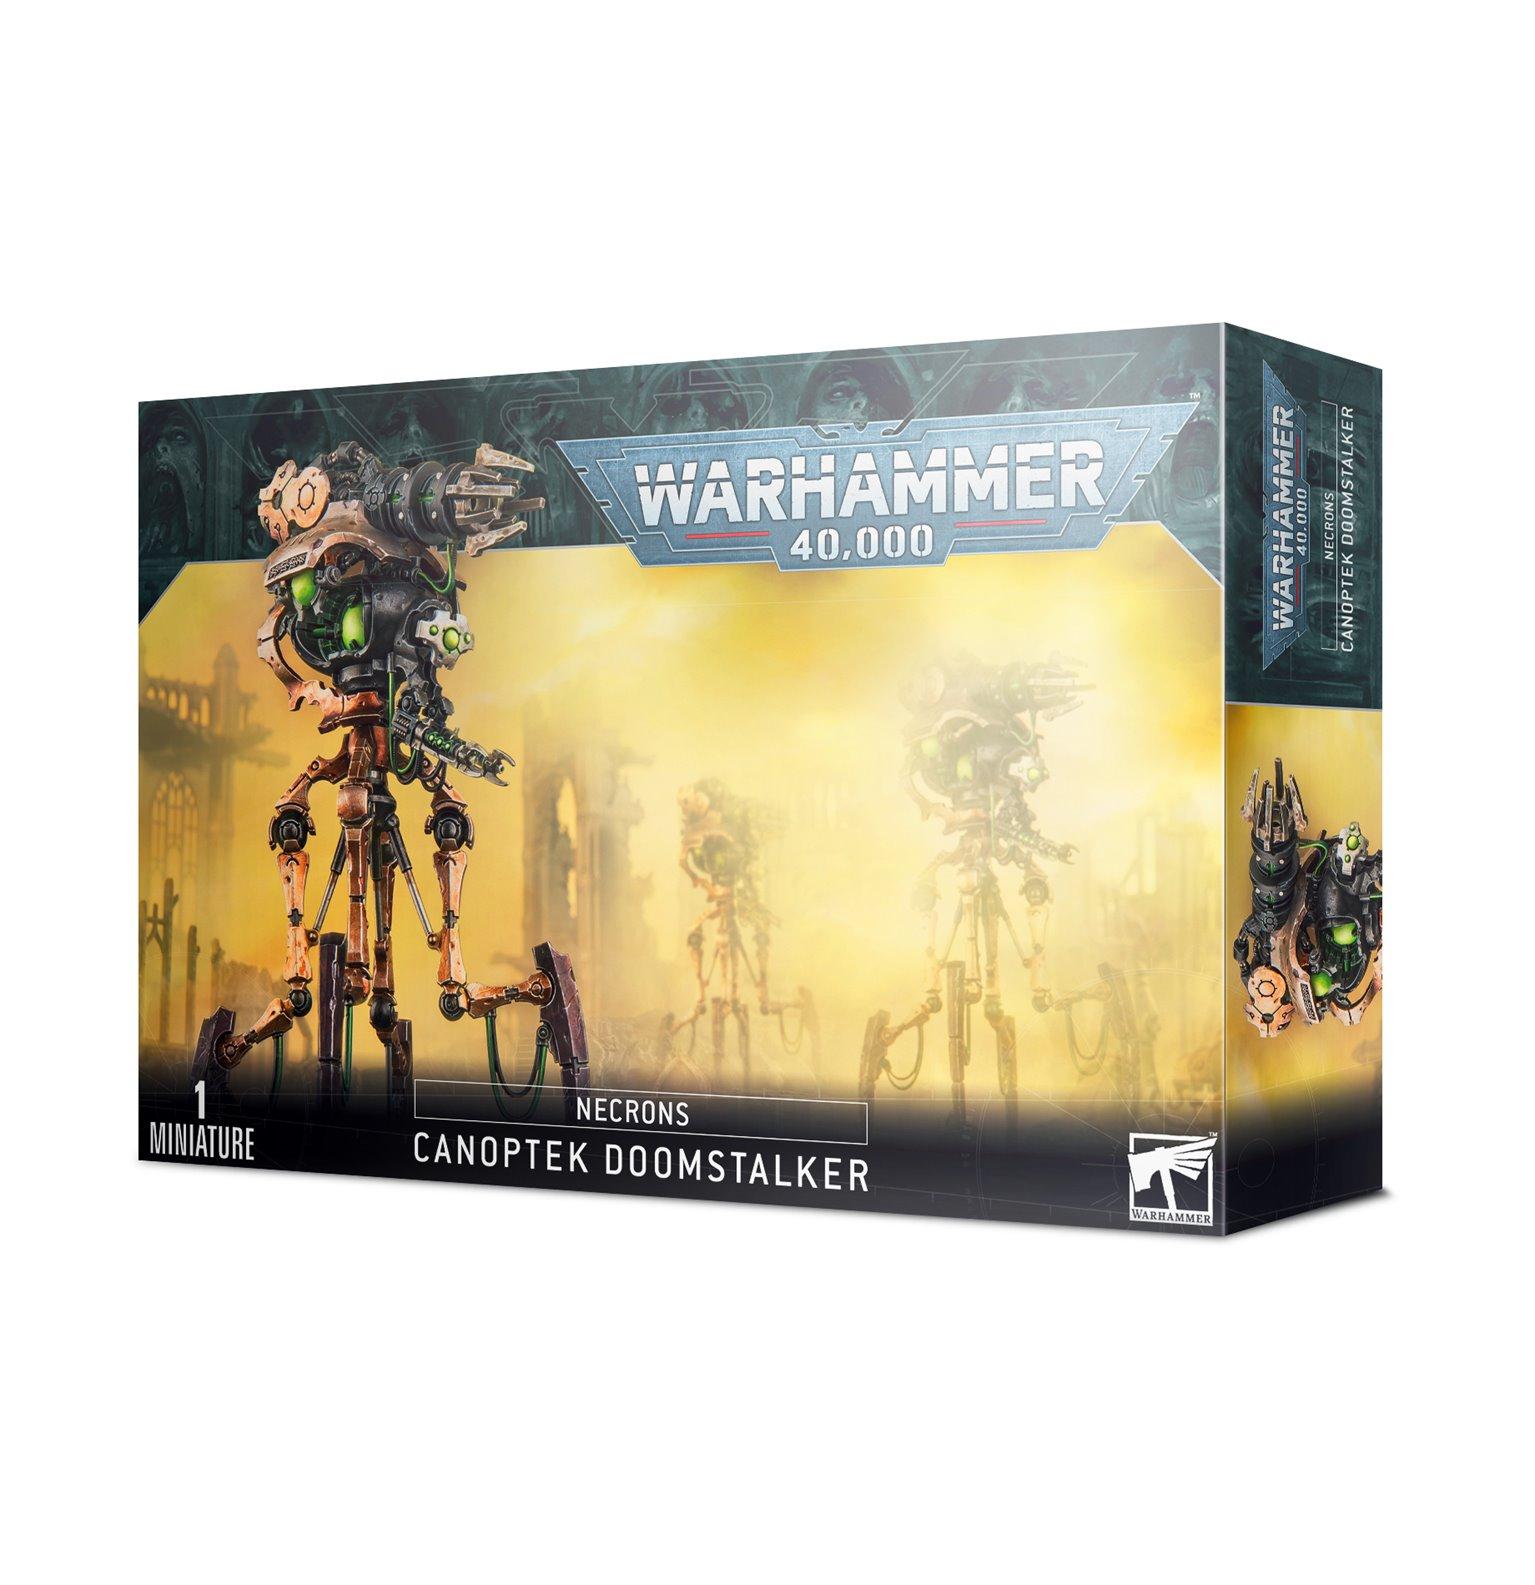 Warhammer 40,000 Necrons Canoptek Doomstalker